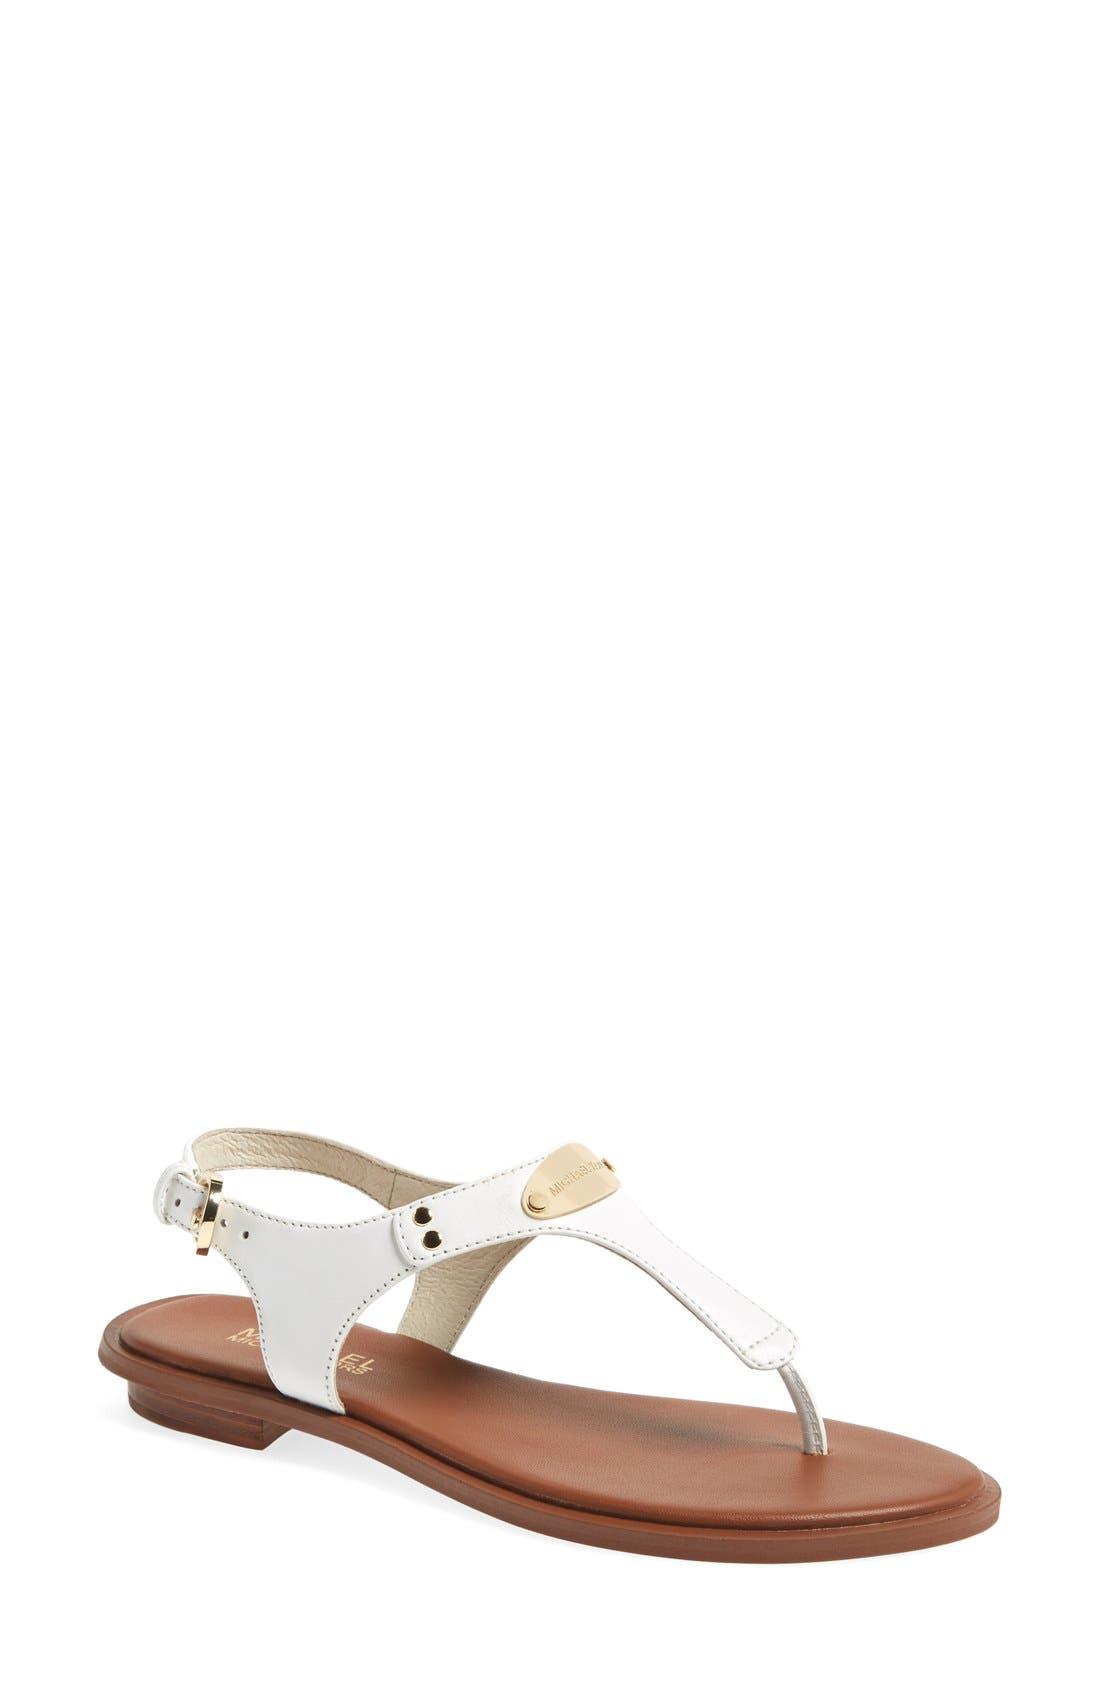 Main Image - MICHAEL Michael Kors 'Plate' Thong Sandal